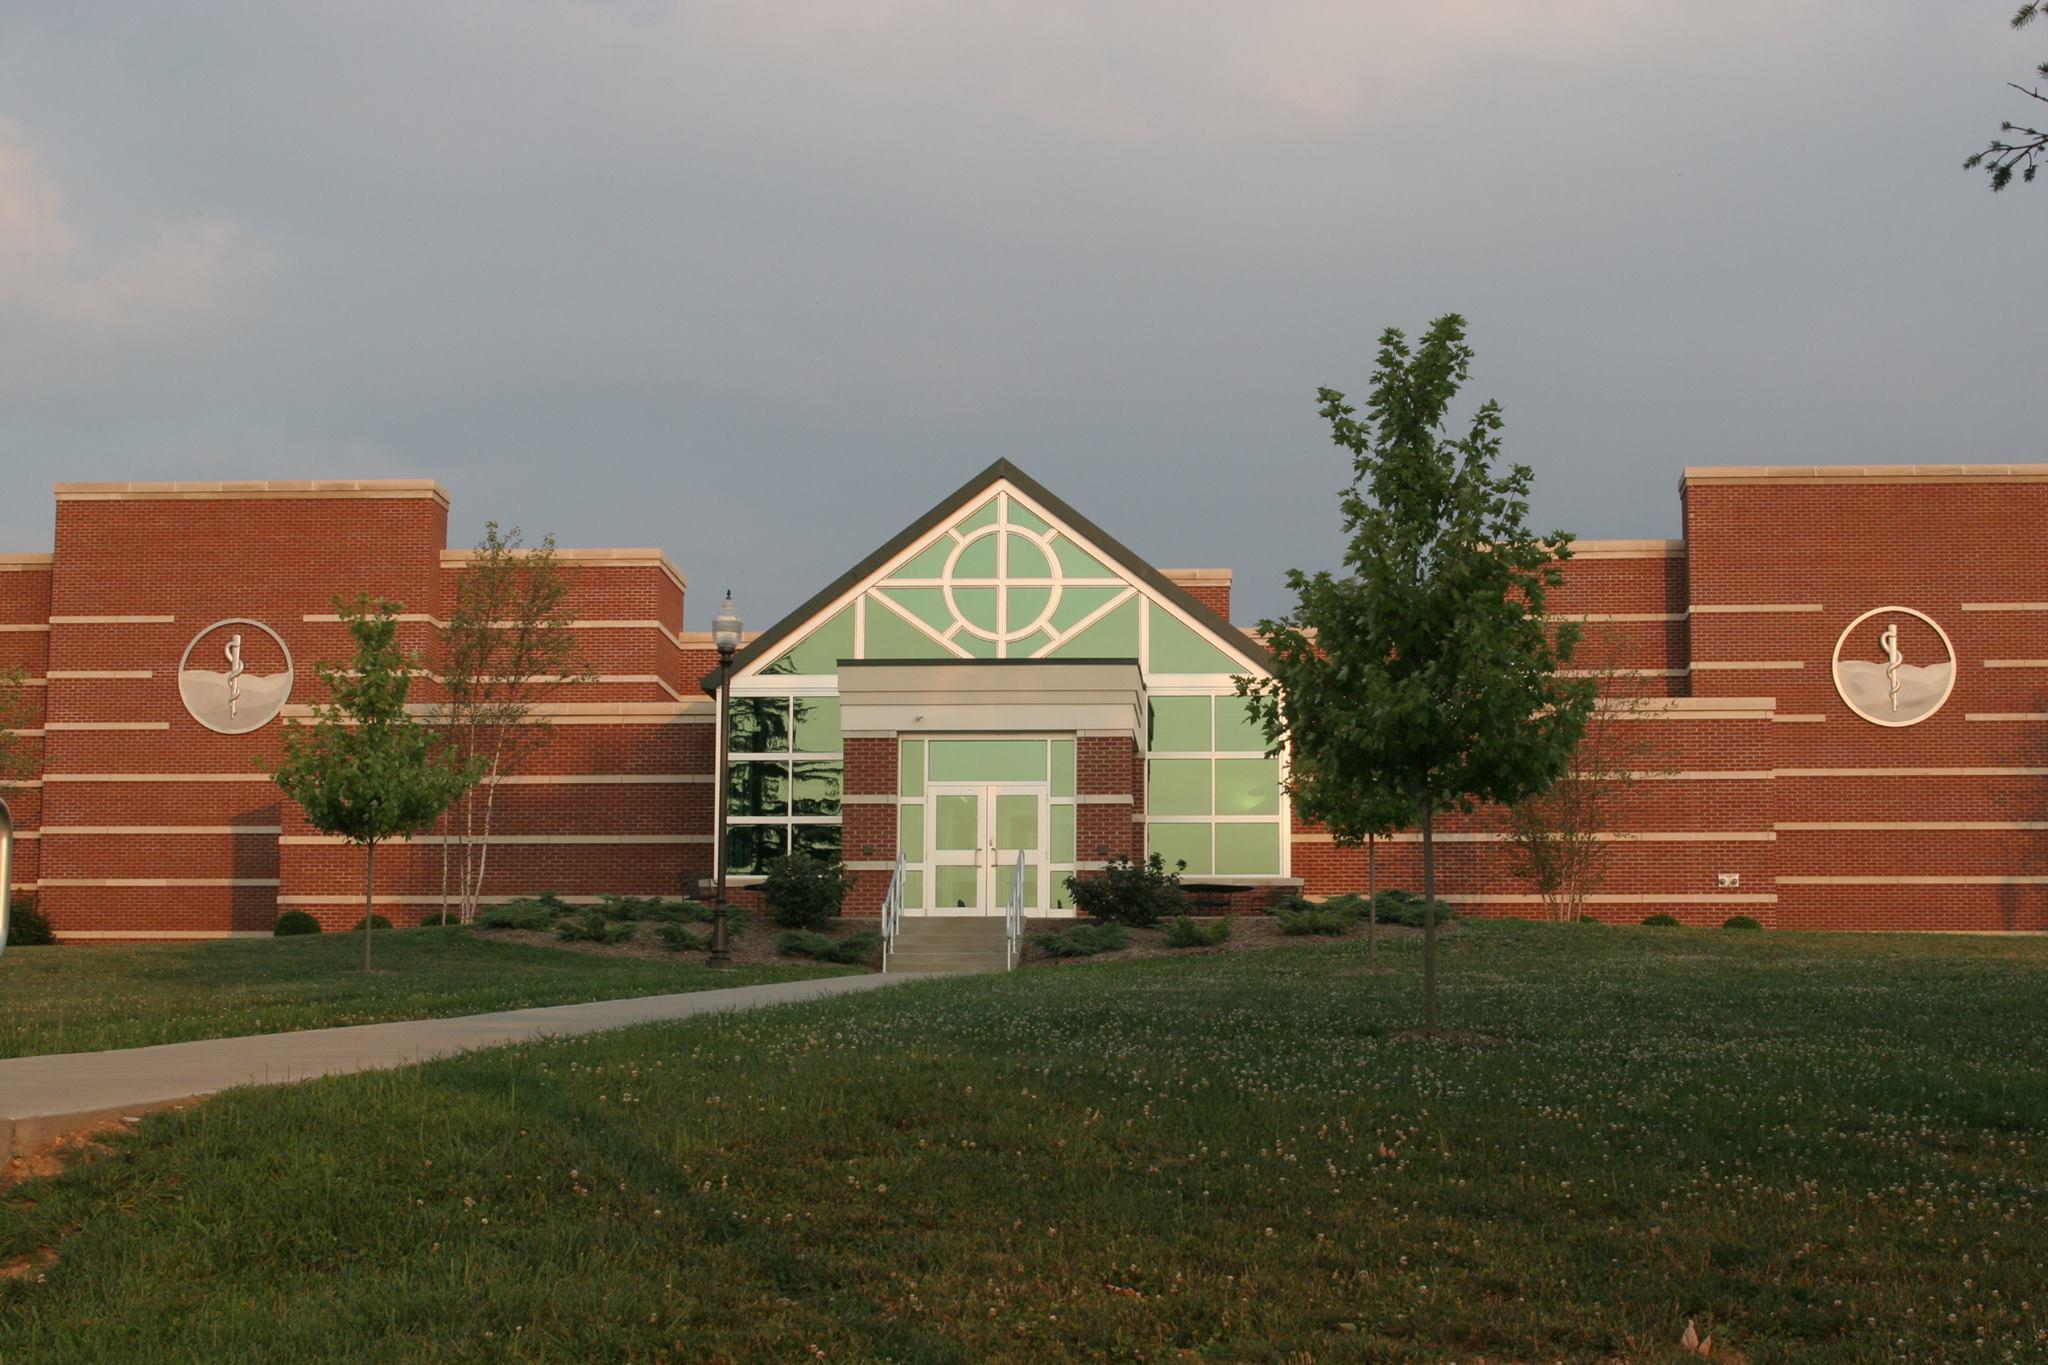 West Virginia School of Osteopathic Medicine image 1